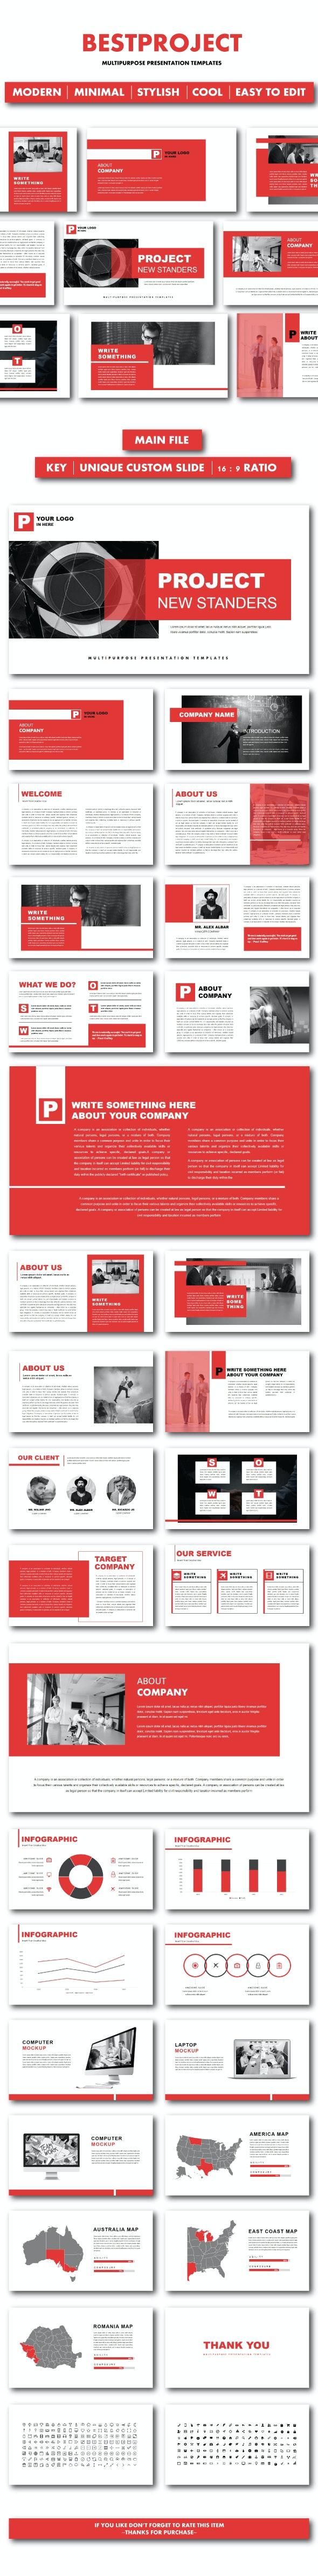 Bestproject Keynote Templates - Keynote Templates Presentation Templates